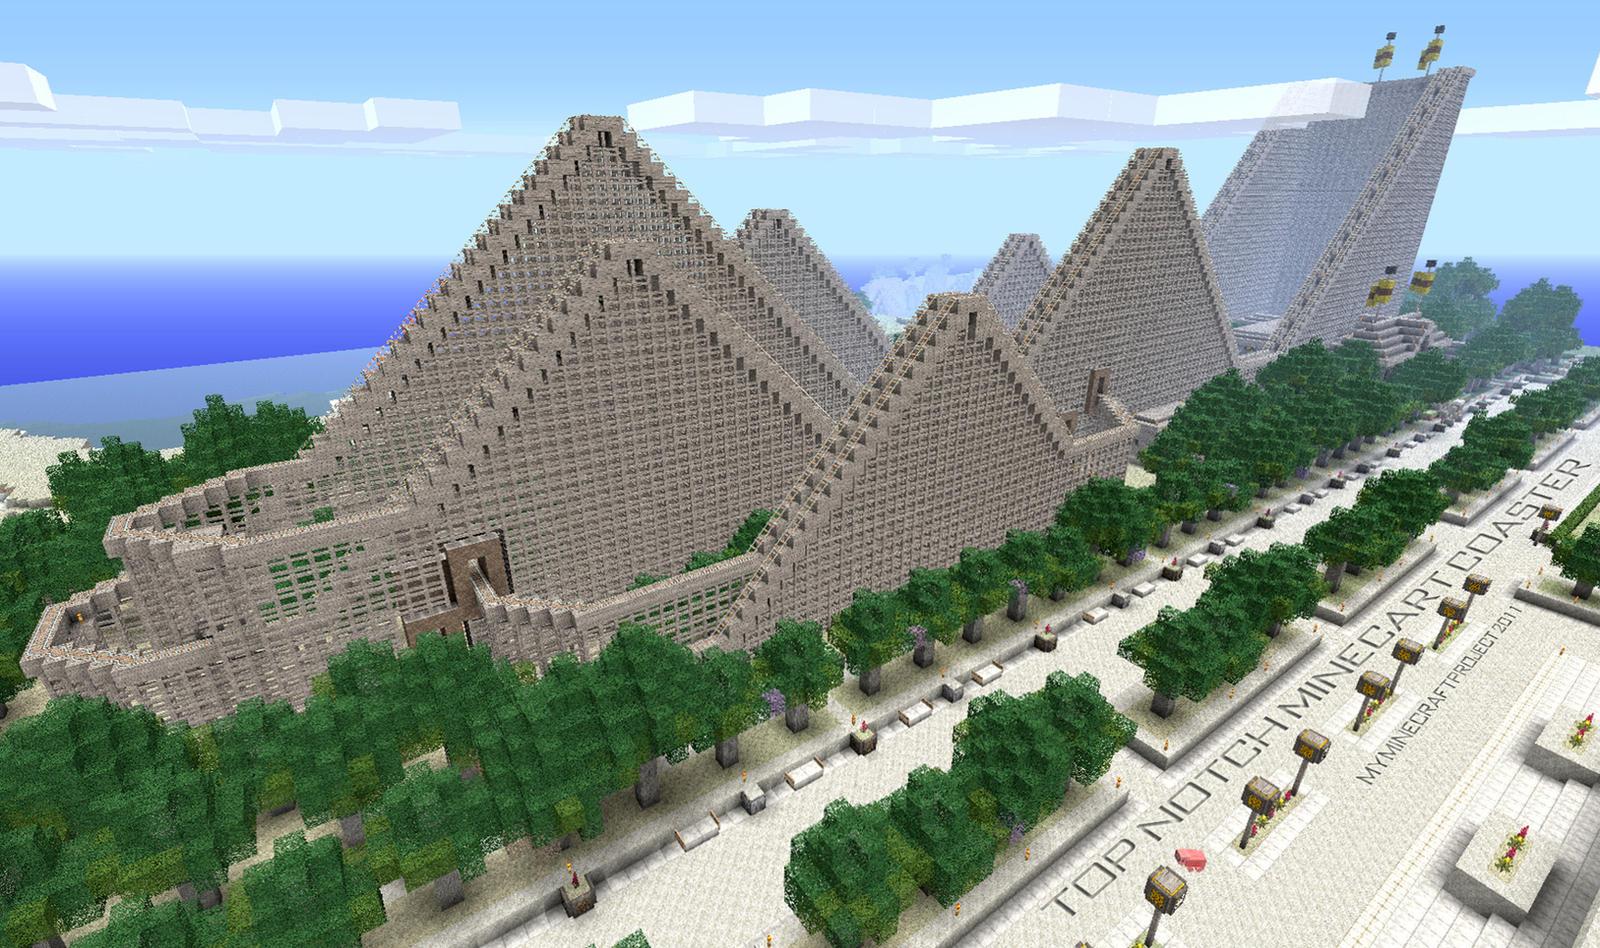 Minecraft Roller Coaster by poste744